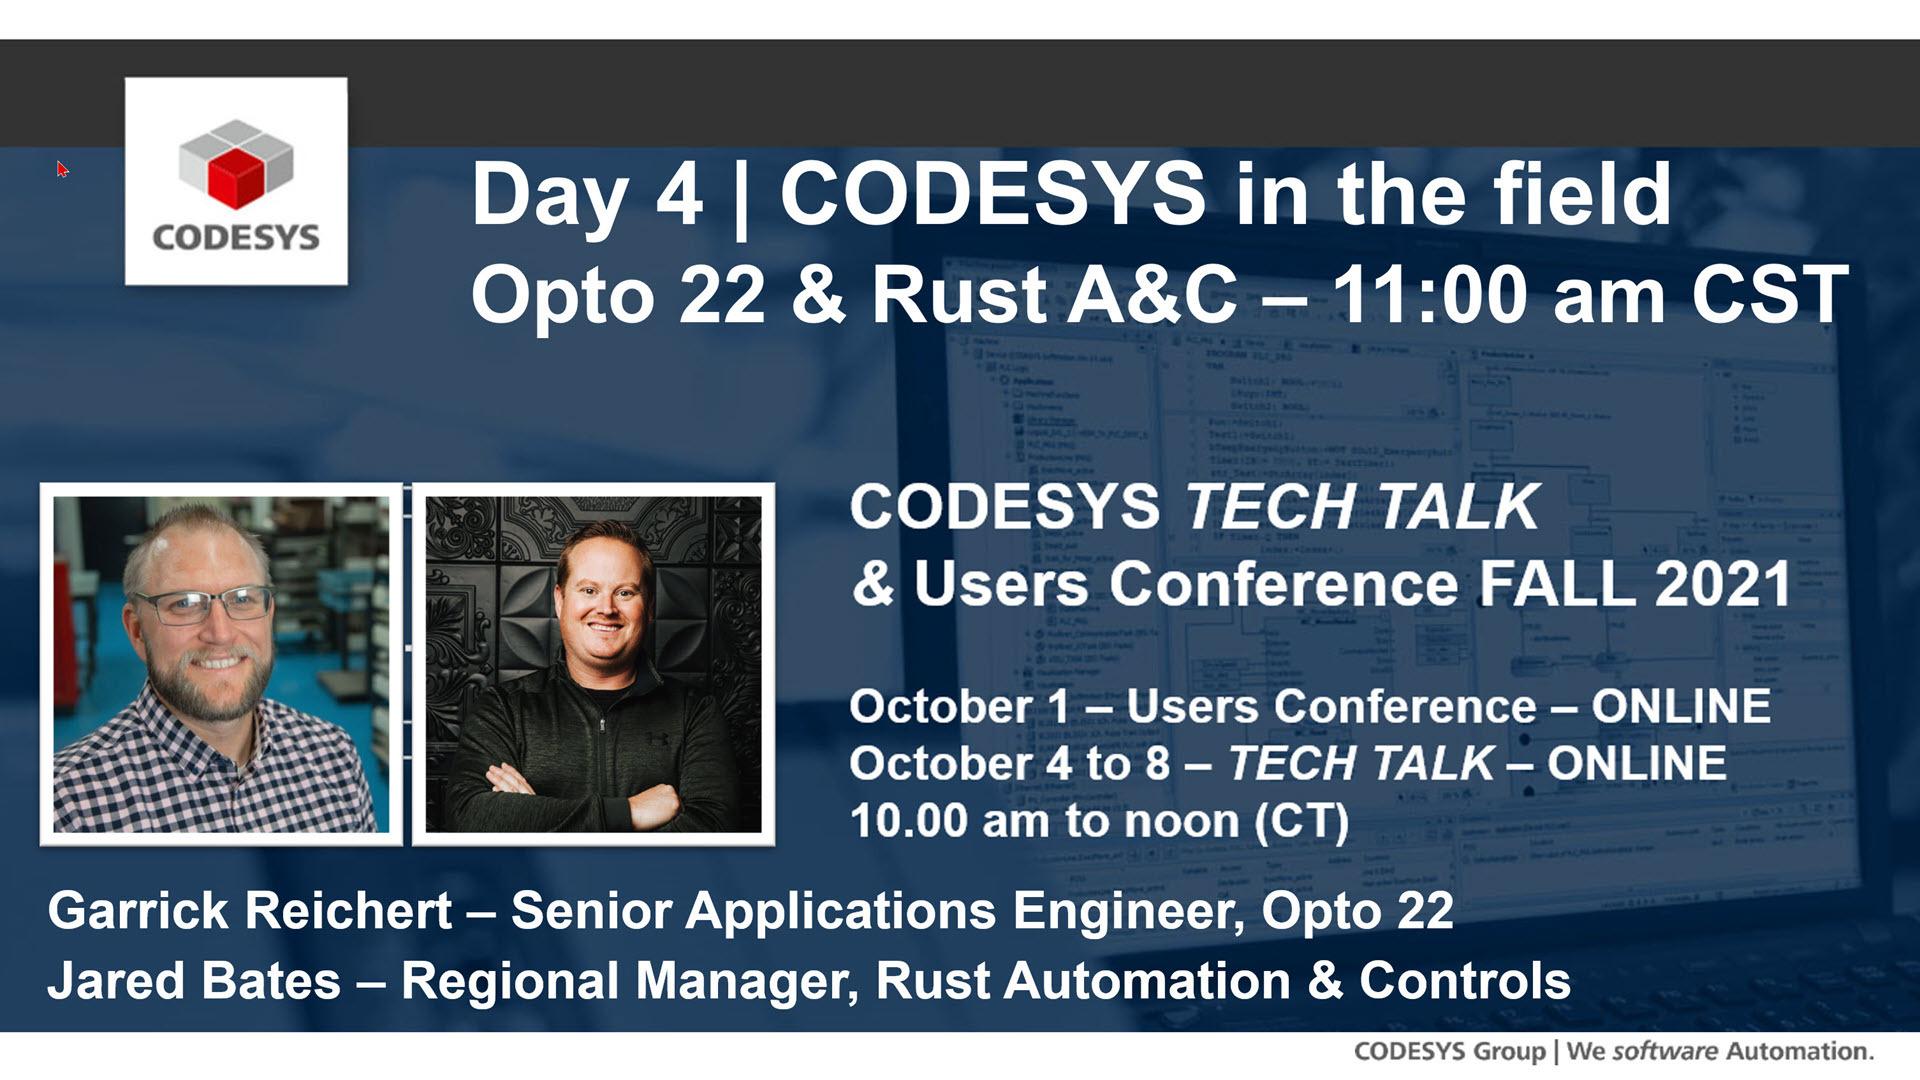 Join us at the Fall 2021 CODESYS Tech Talk